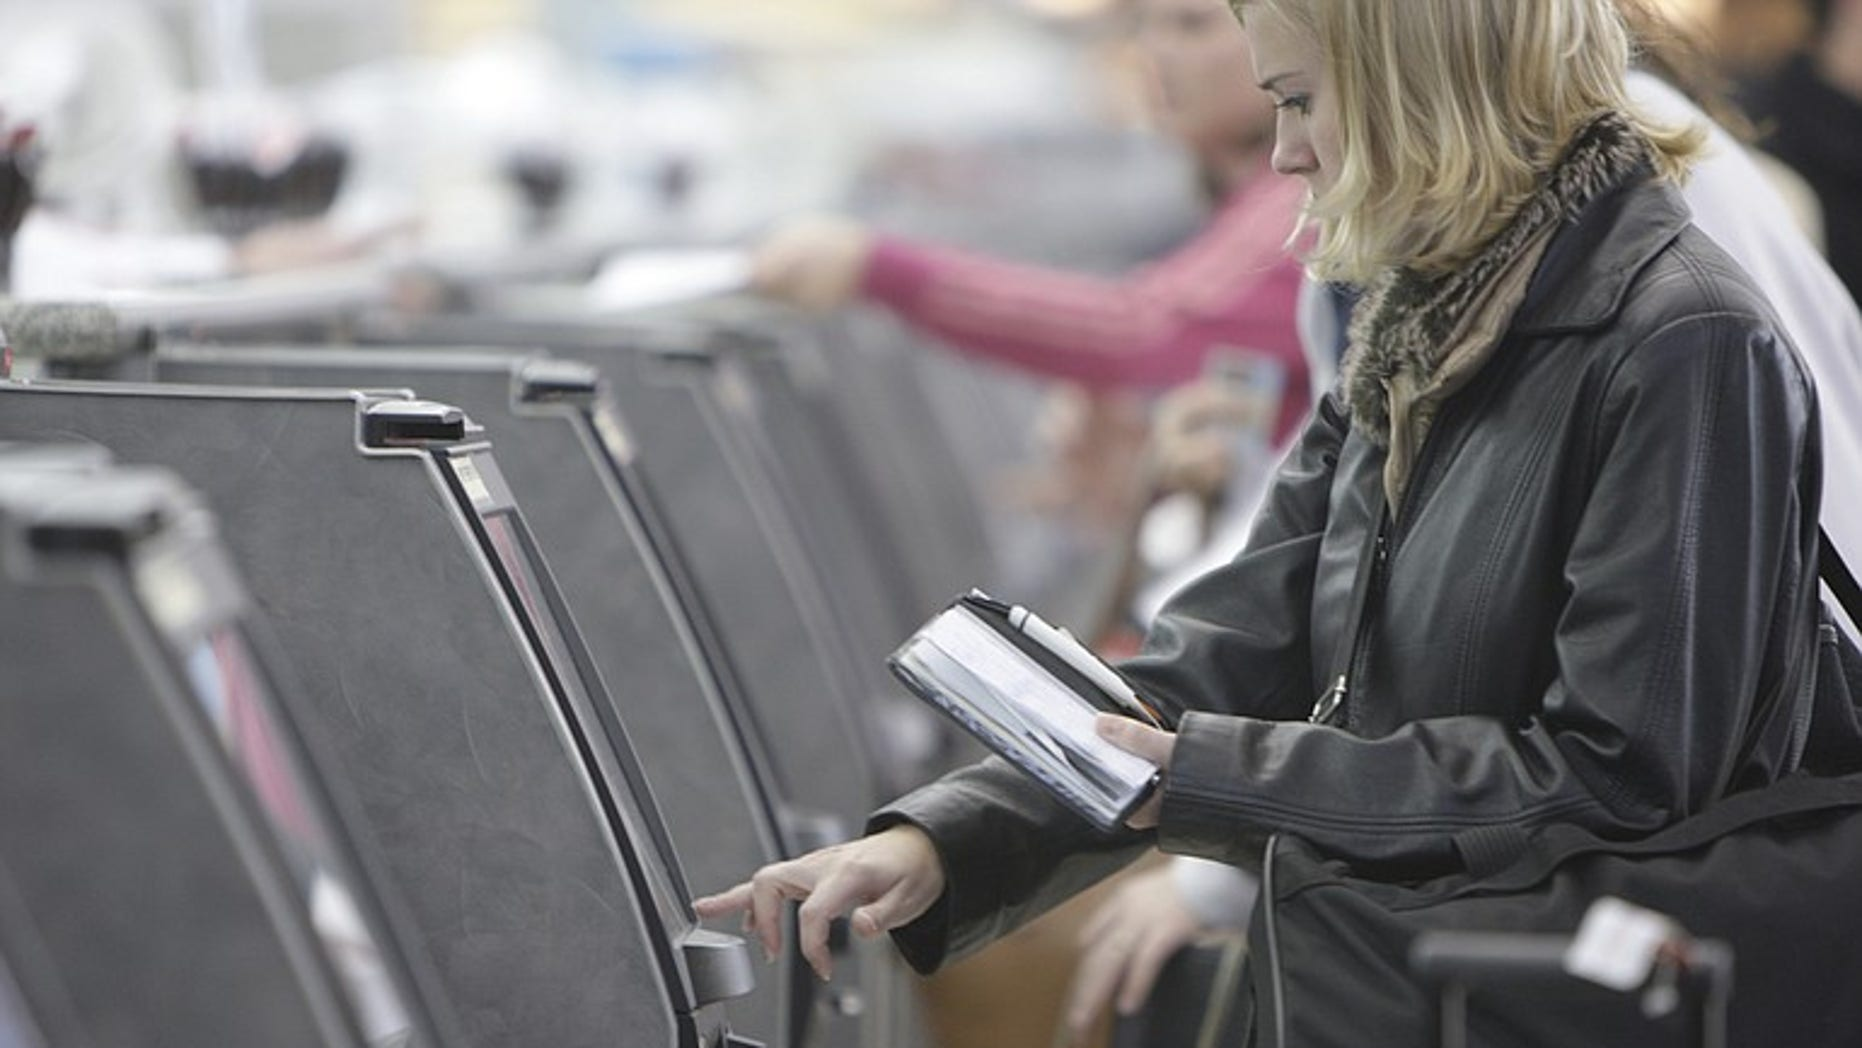 An American Airlines passenger checks into a ticket kiosk at Lambert St. Louis International Airport.